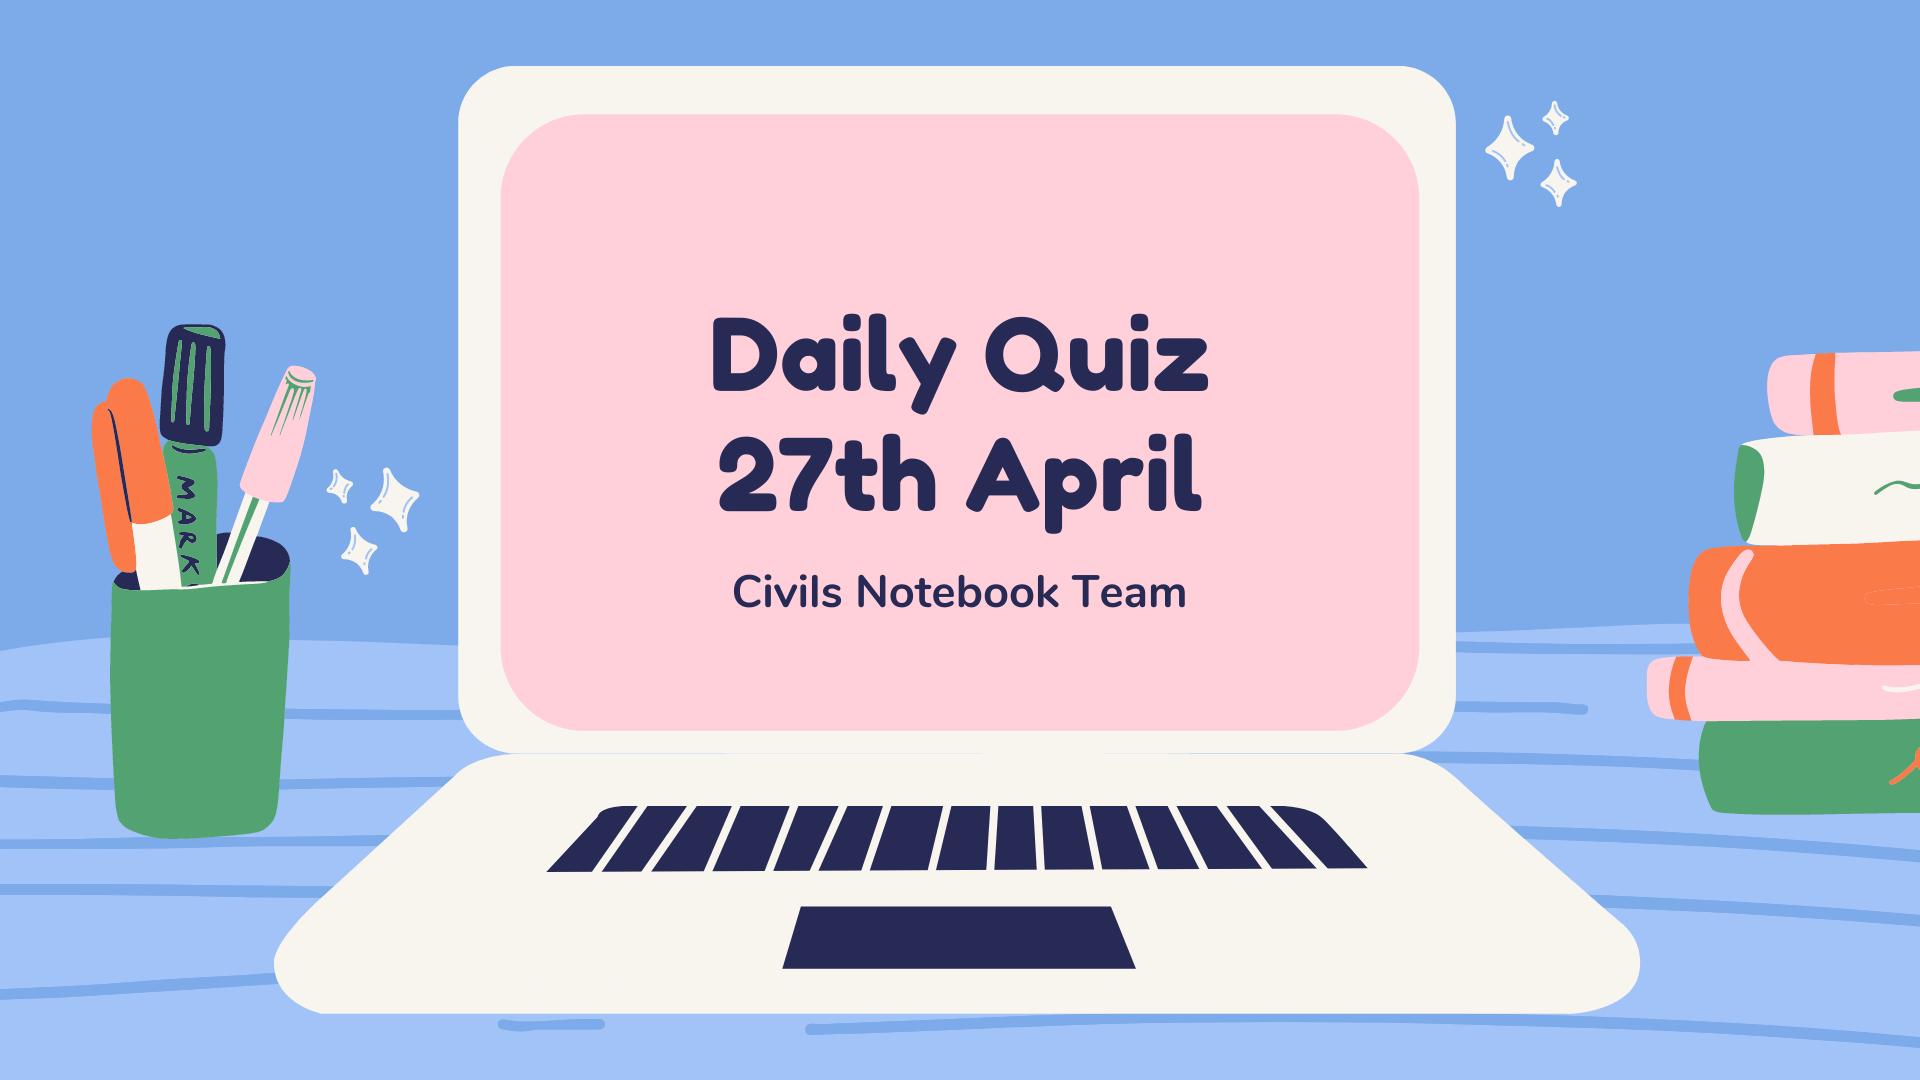 Daily Quiz: 27th April